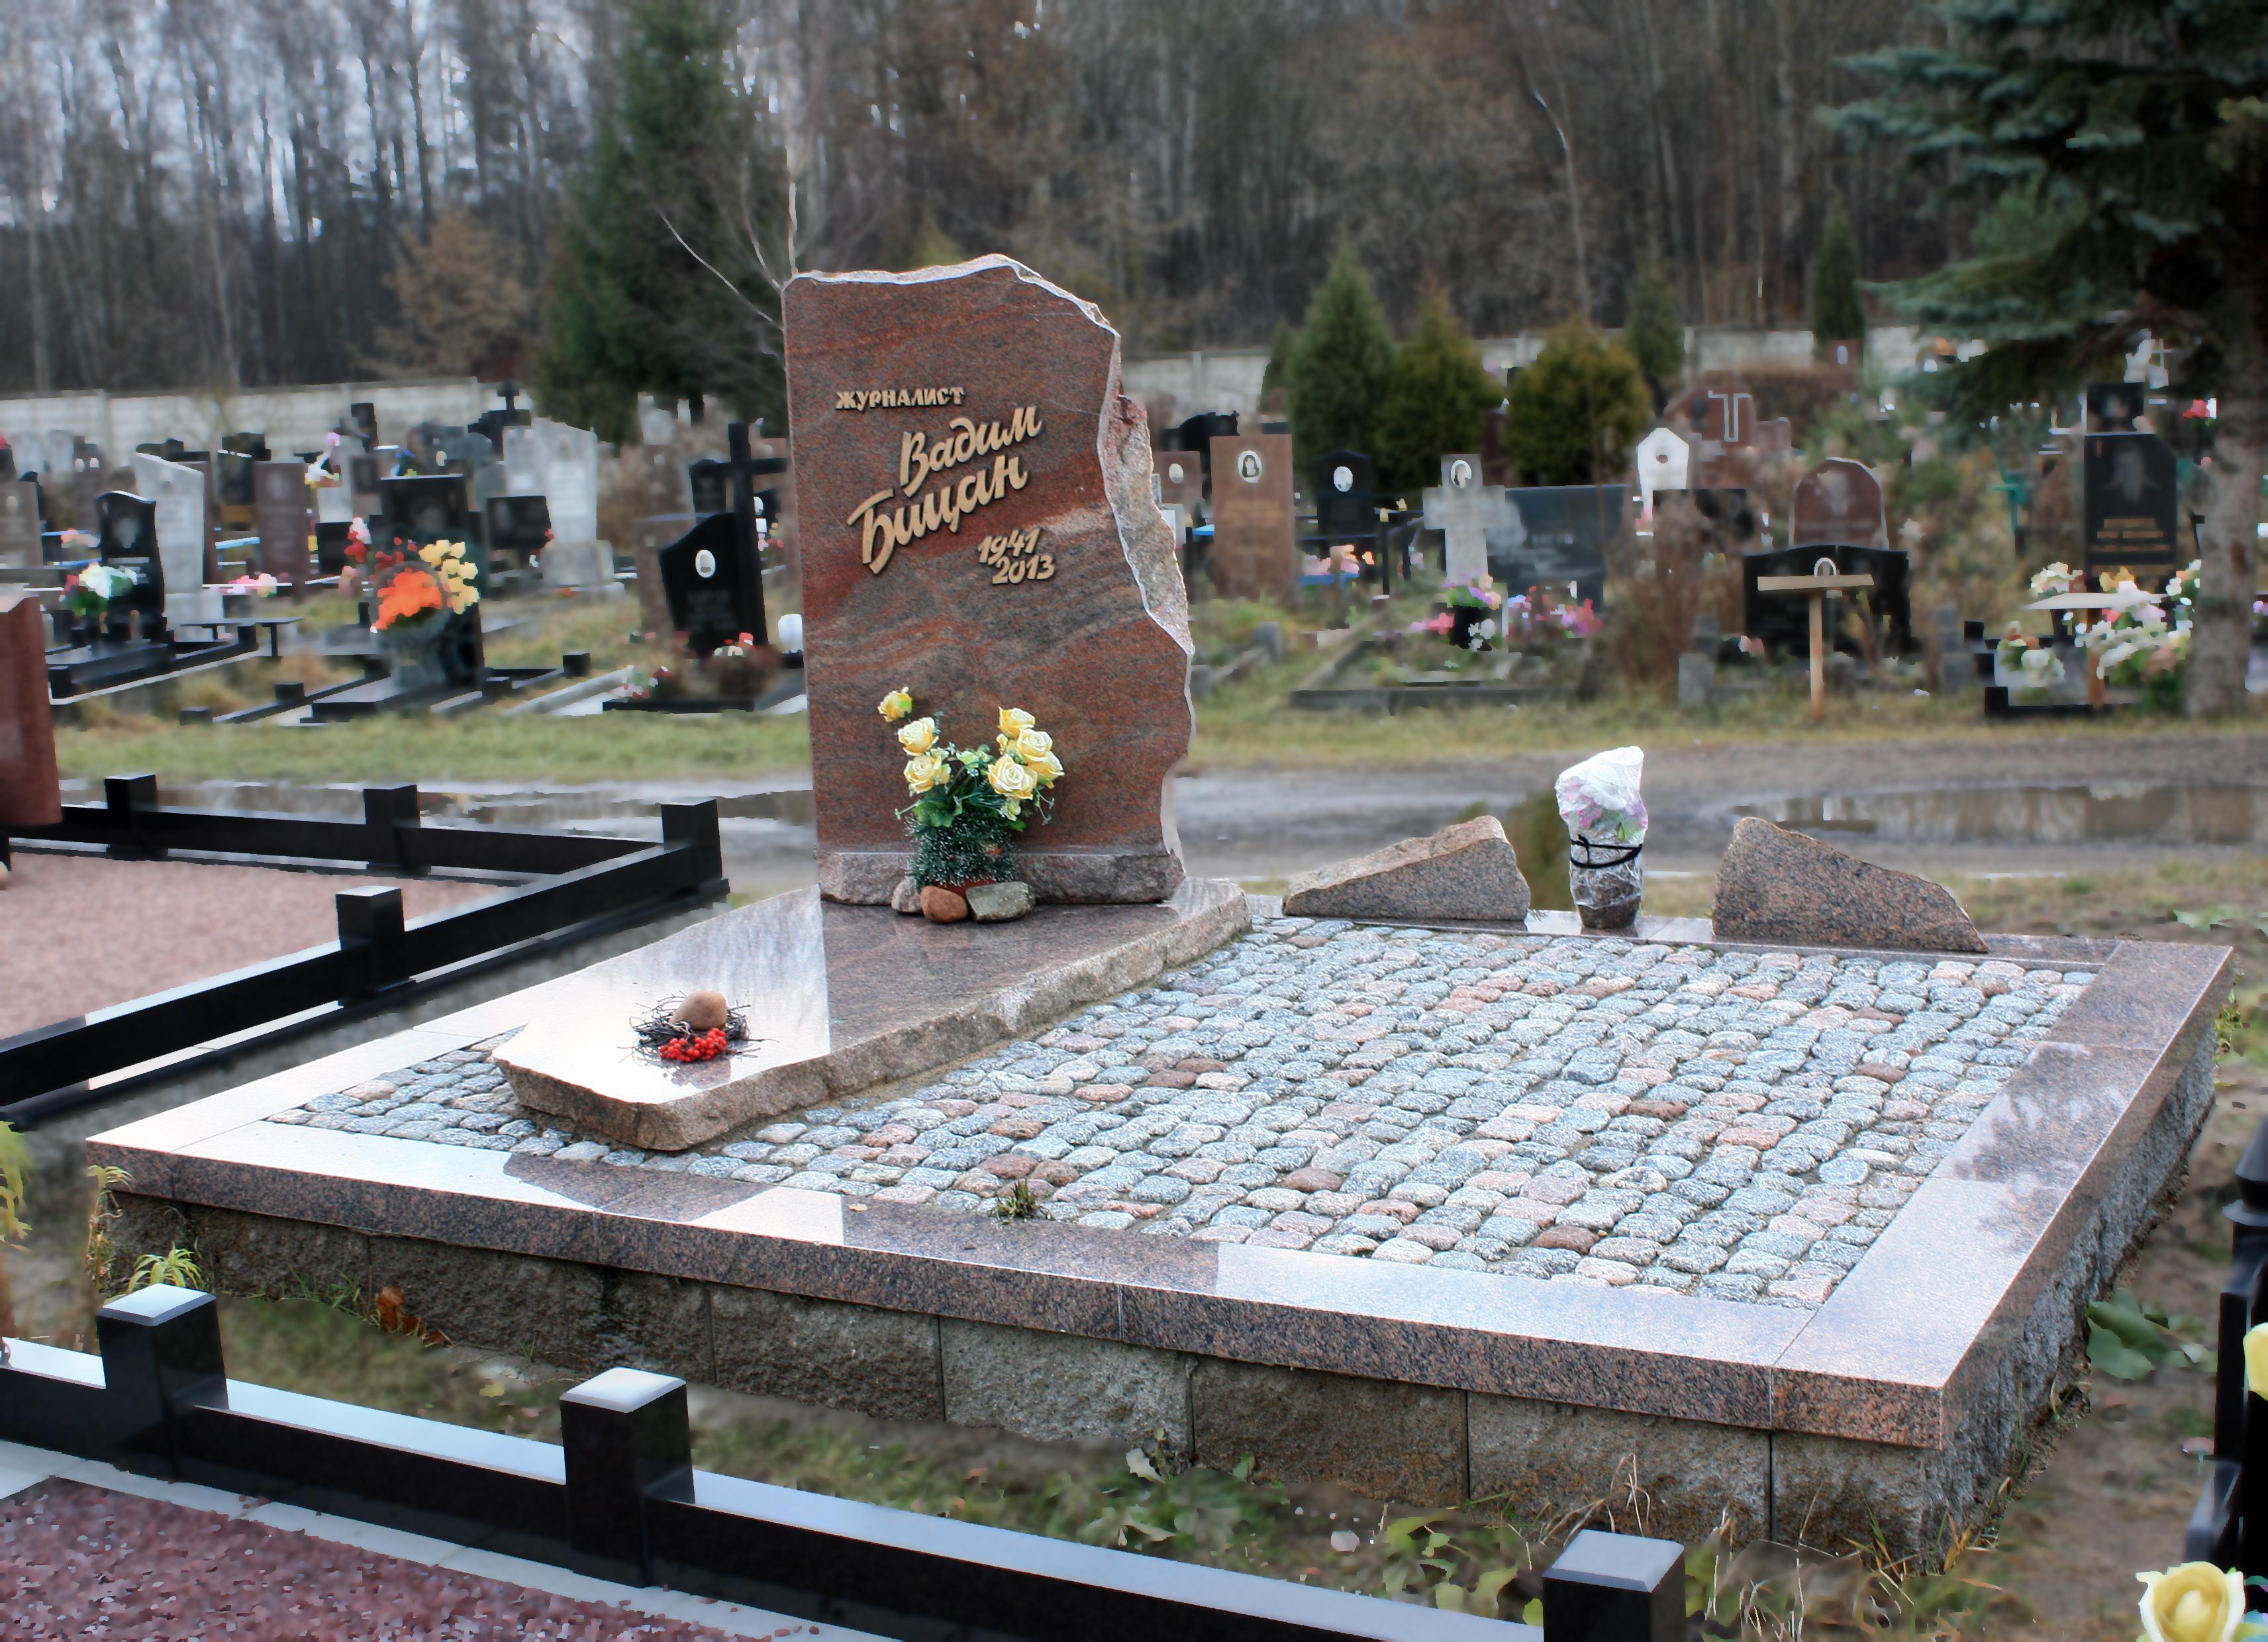 благоустройство могил: мощение брусчаткой